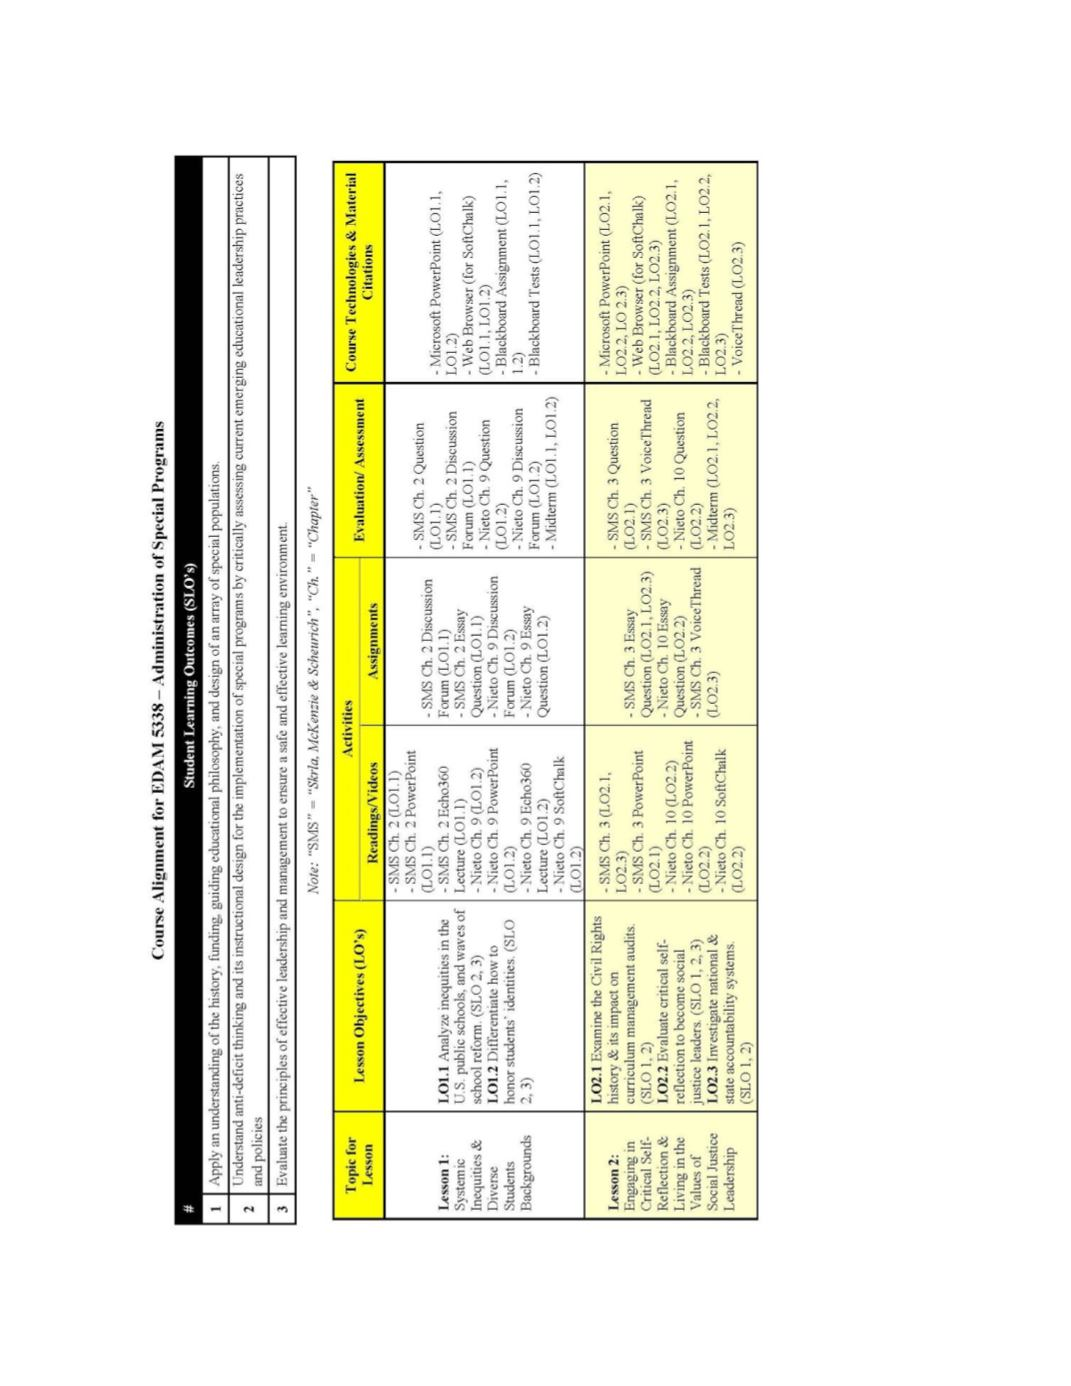 Online Course Development Manual